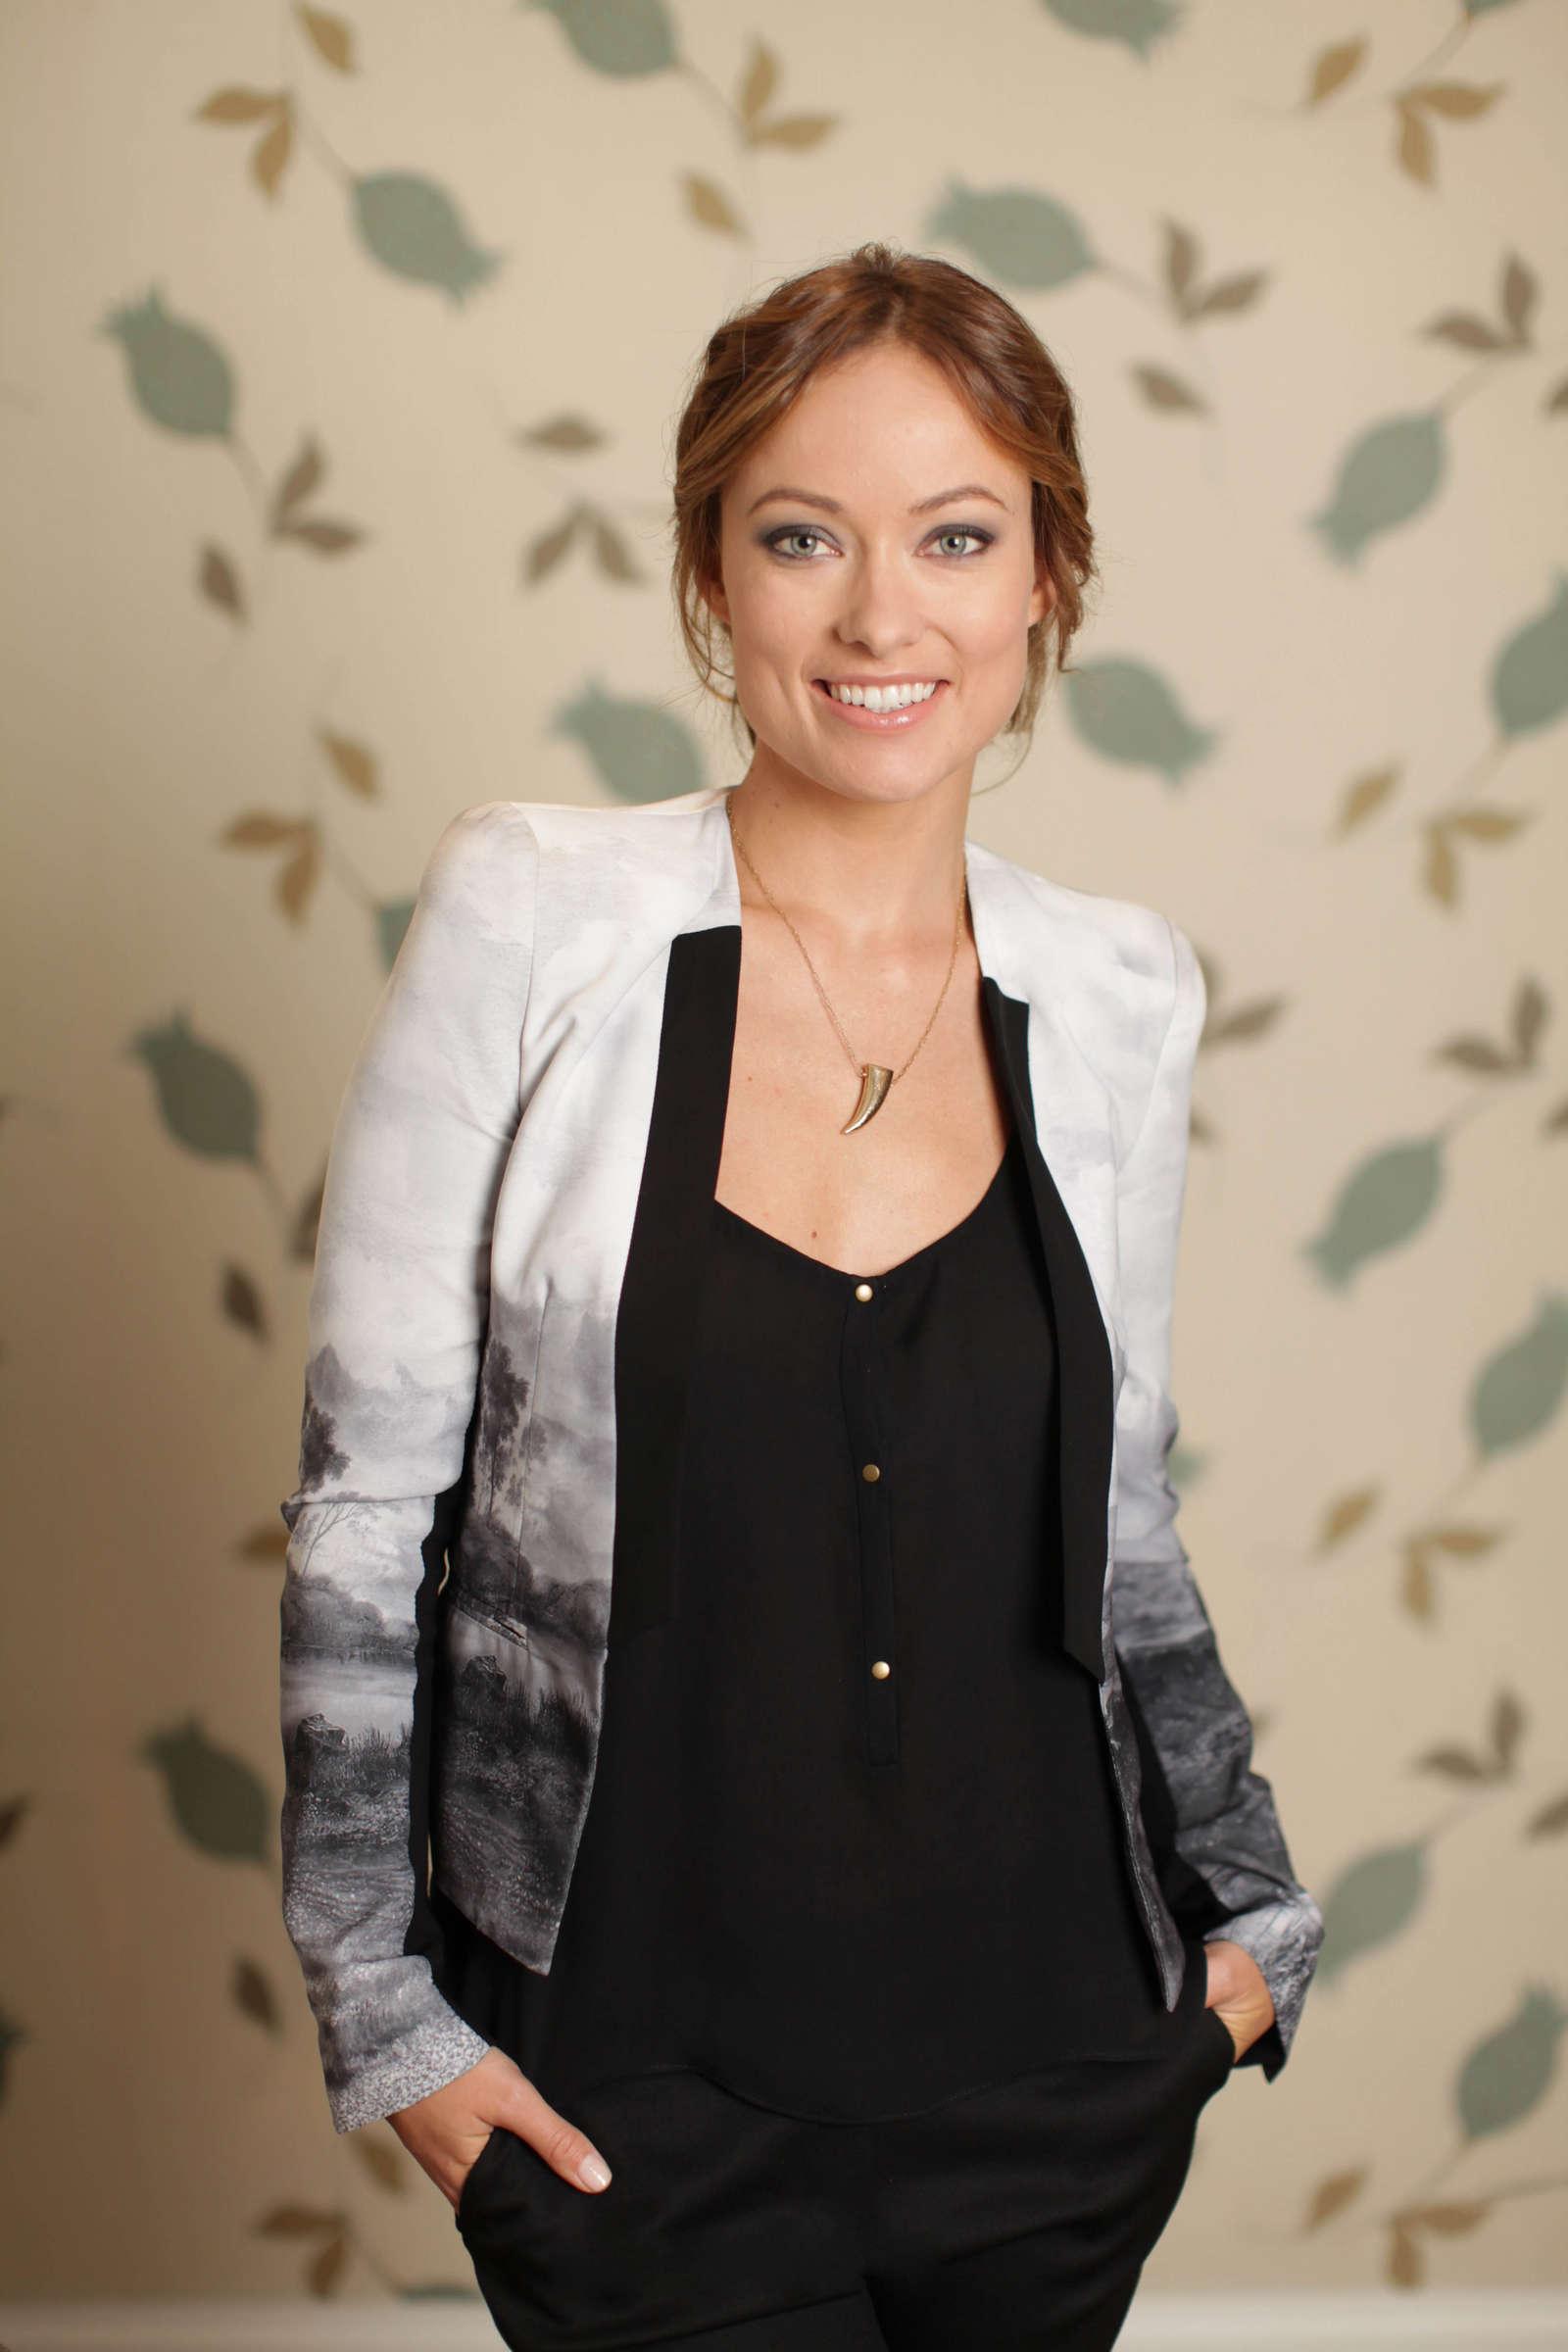 Olivia wilde 2012 todd plitt photoshoot rbc for Ariadne artiles listal